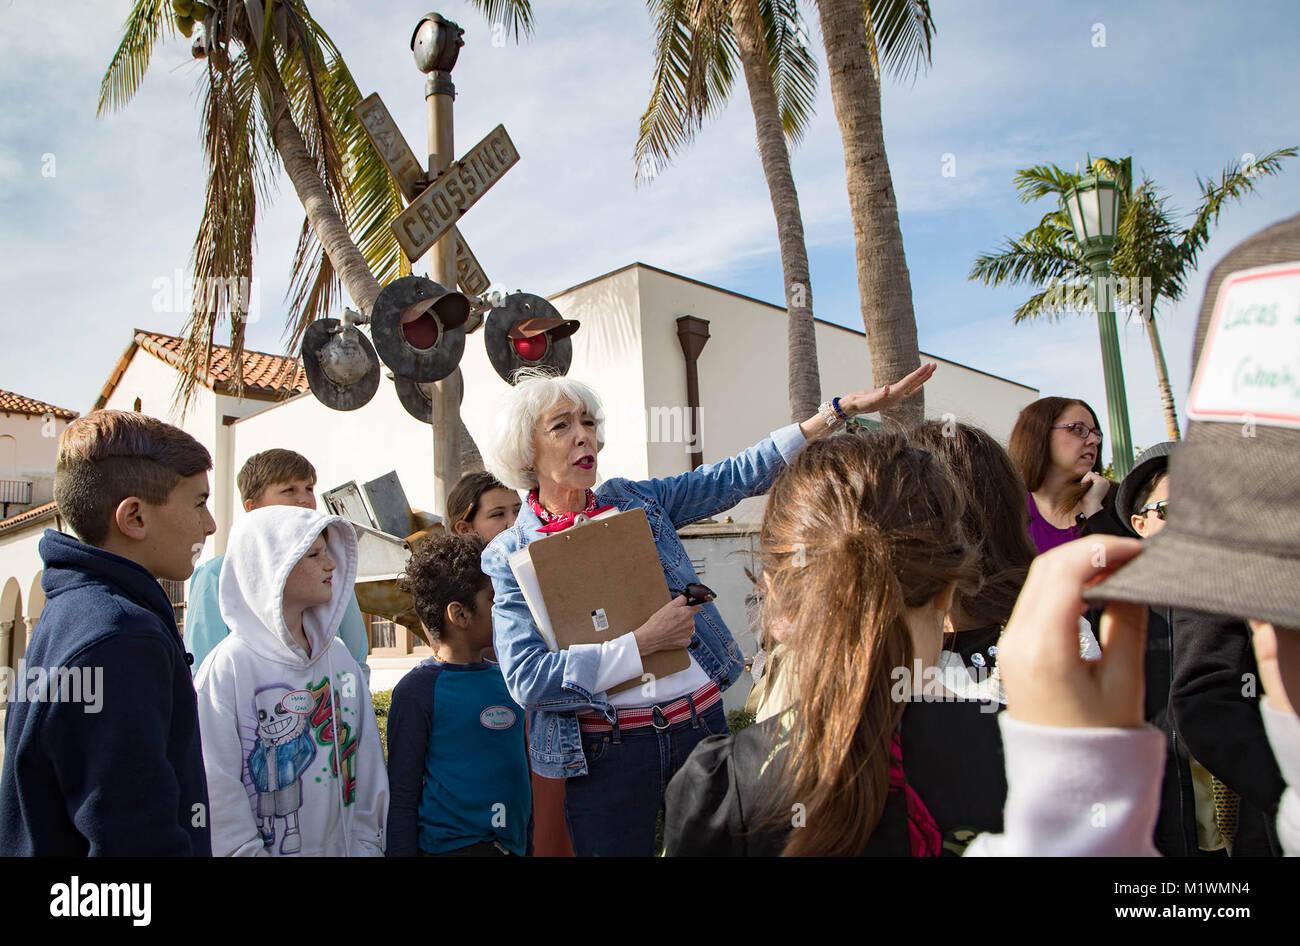 Boca Raton, Florida, USA. 2nd Feb, 2018. Susie Tabor, a volunteer for the Historical Society of Boca Raton, teaches - Stock Image